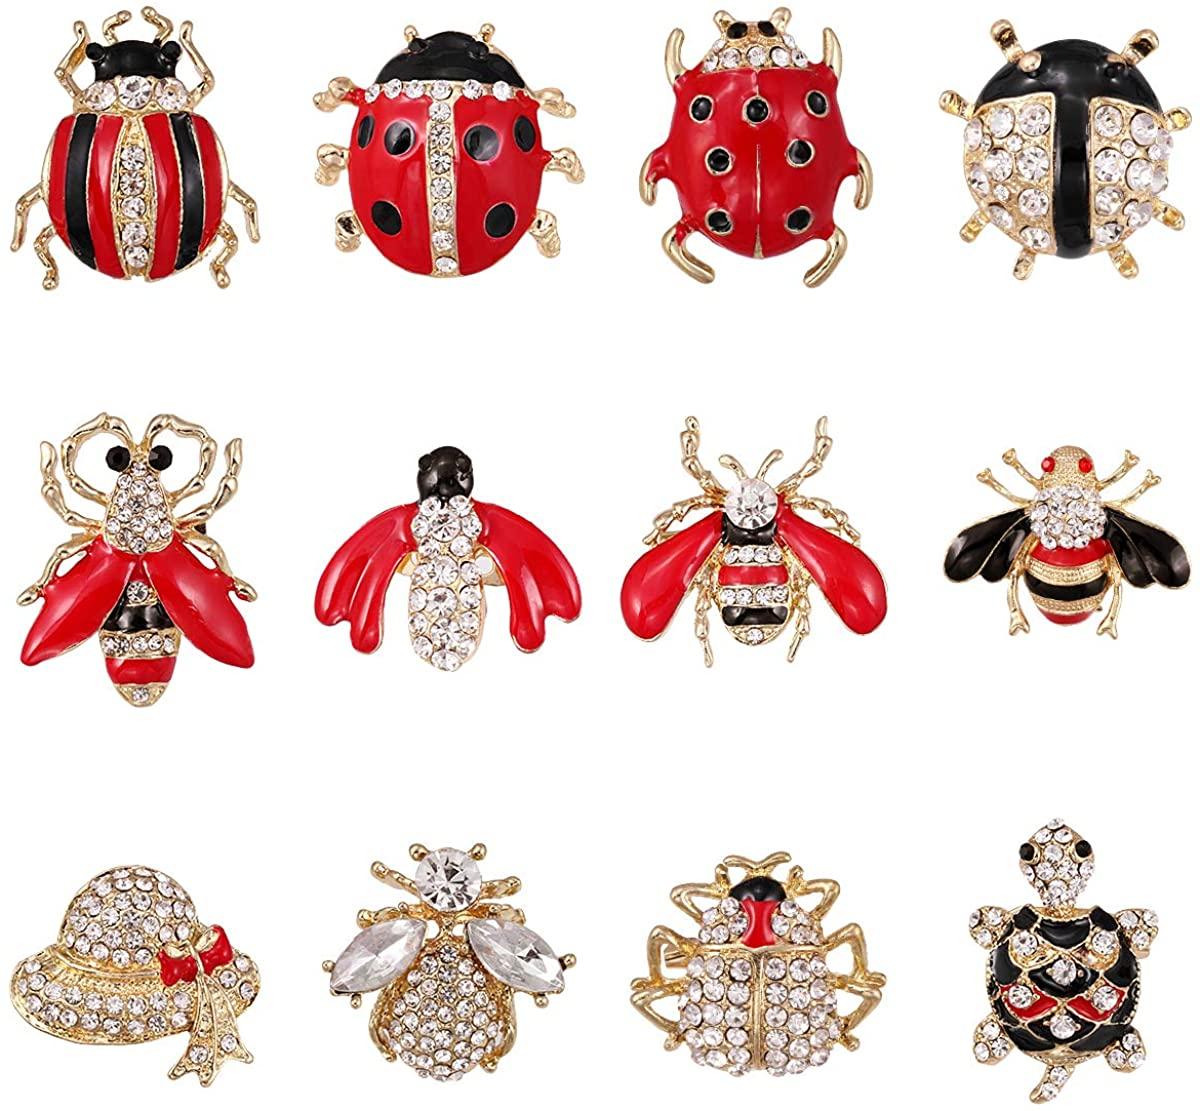 WeimanJewelry Lot 12pcs Enamel Crystal Rhinestone Animal Honeybee Beetle Turtle Insect Brooch Pin Set for Women DIY Decoration